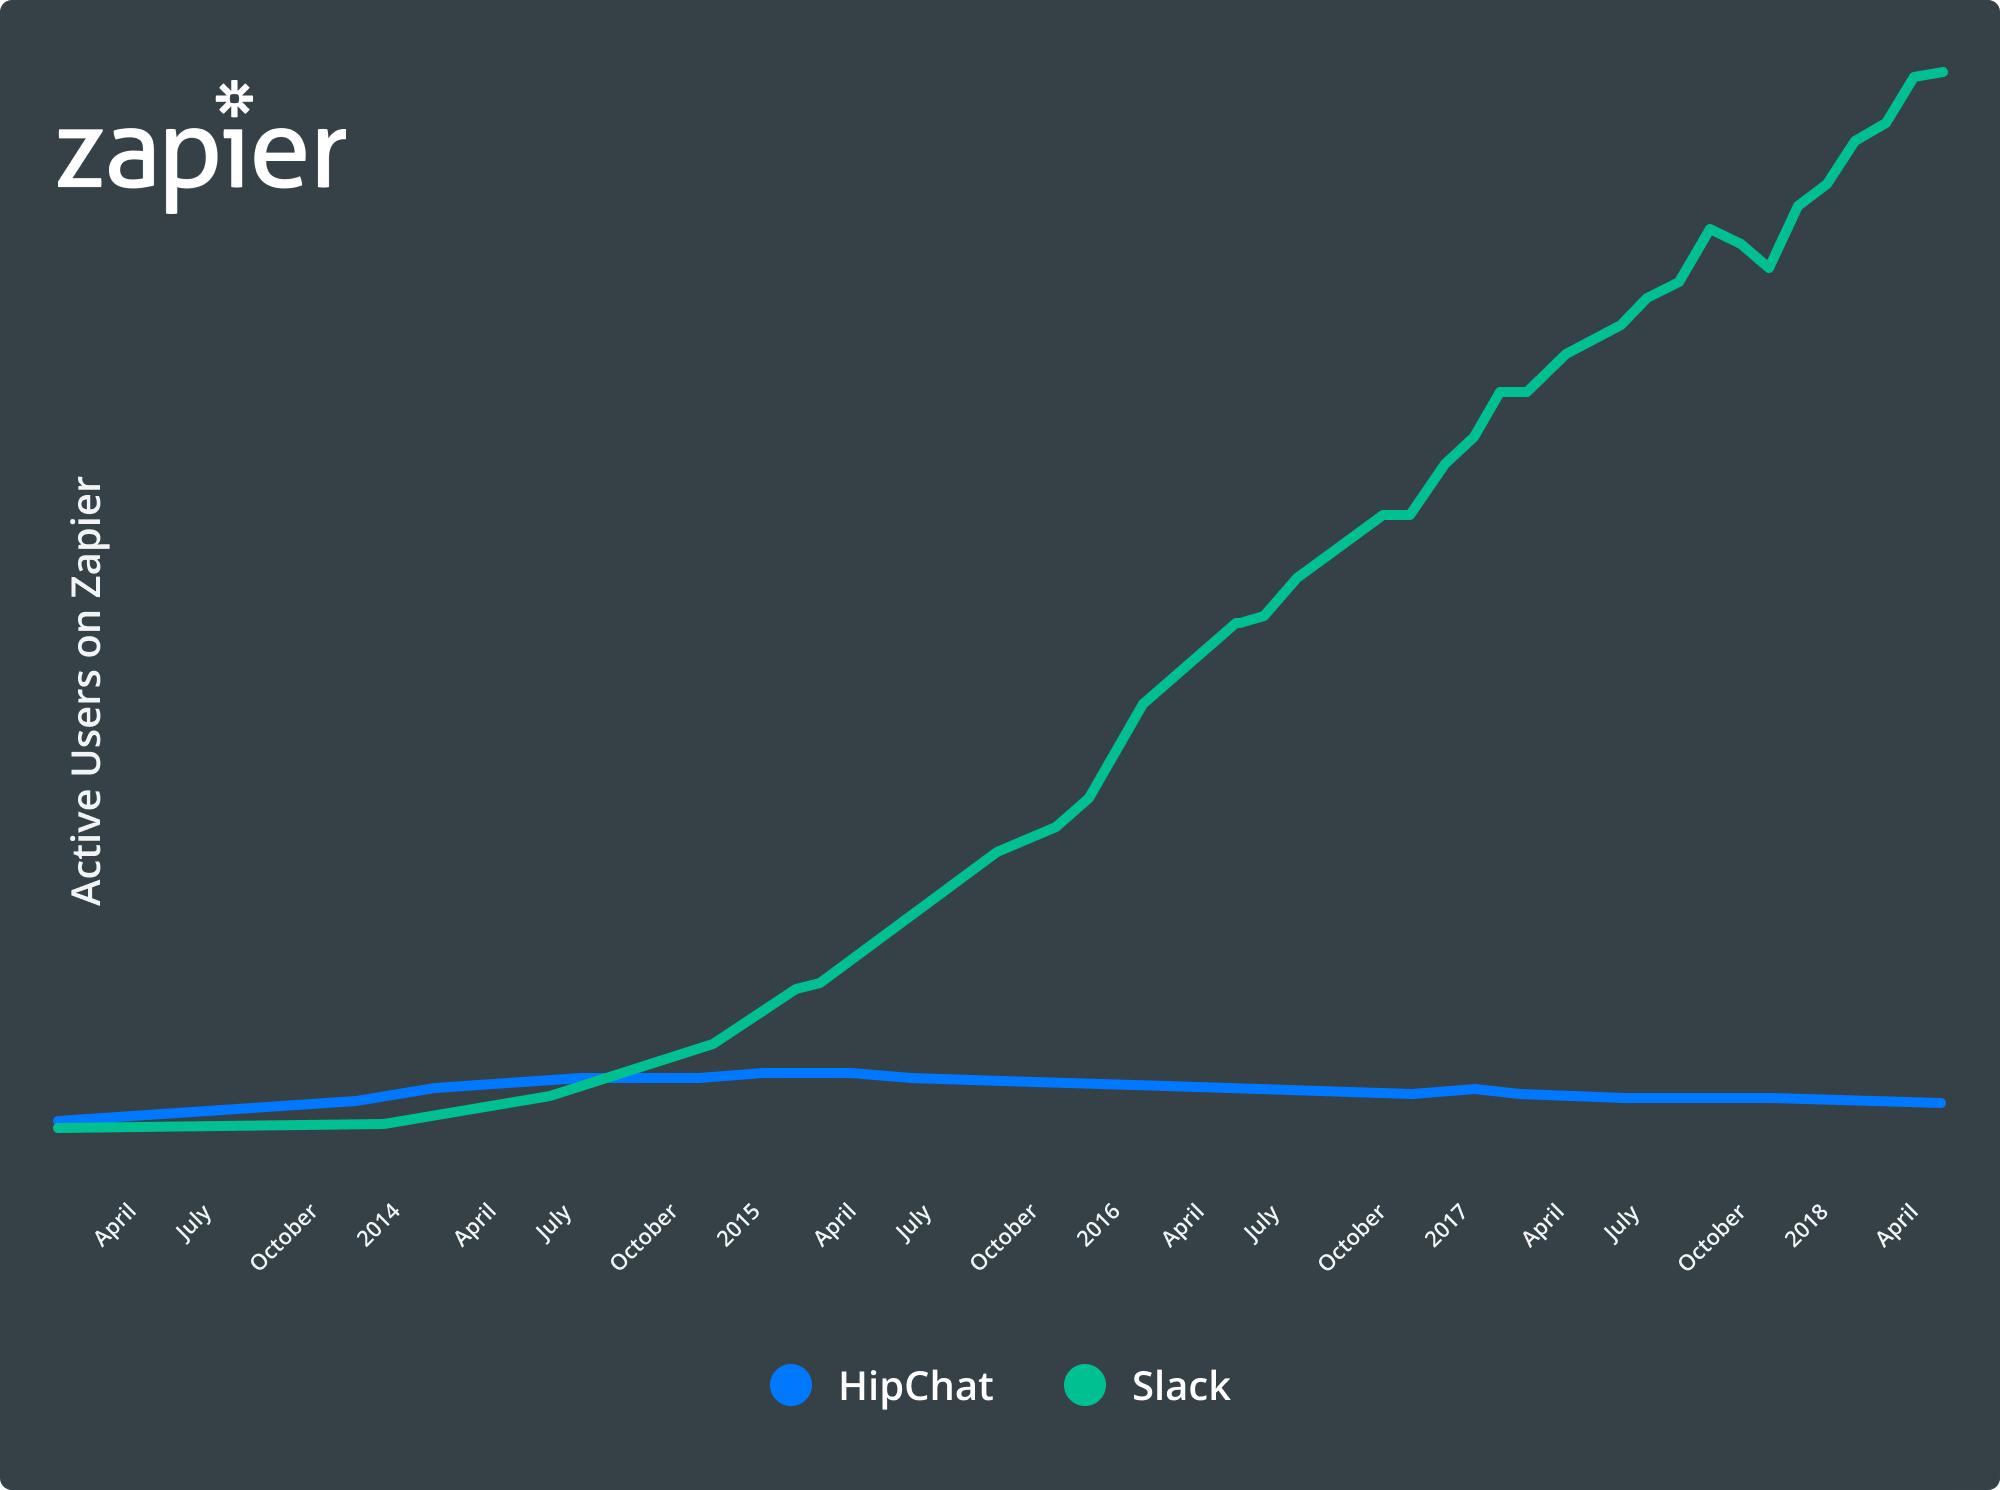 Slack versus HipChat growth